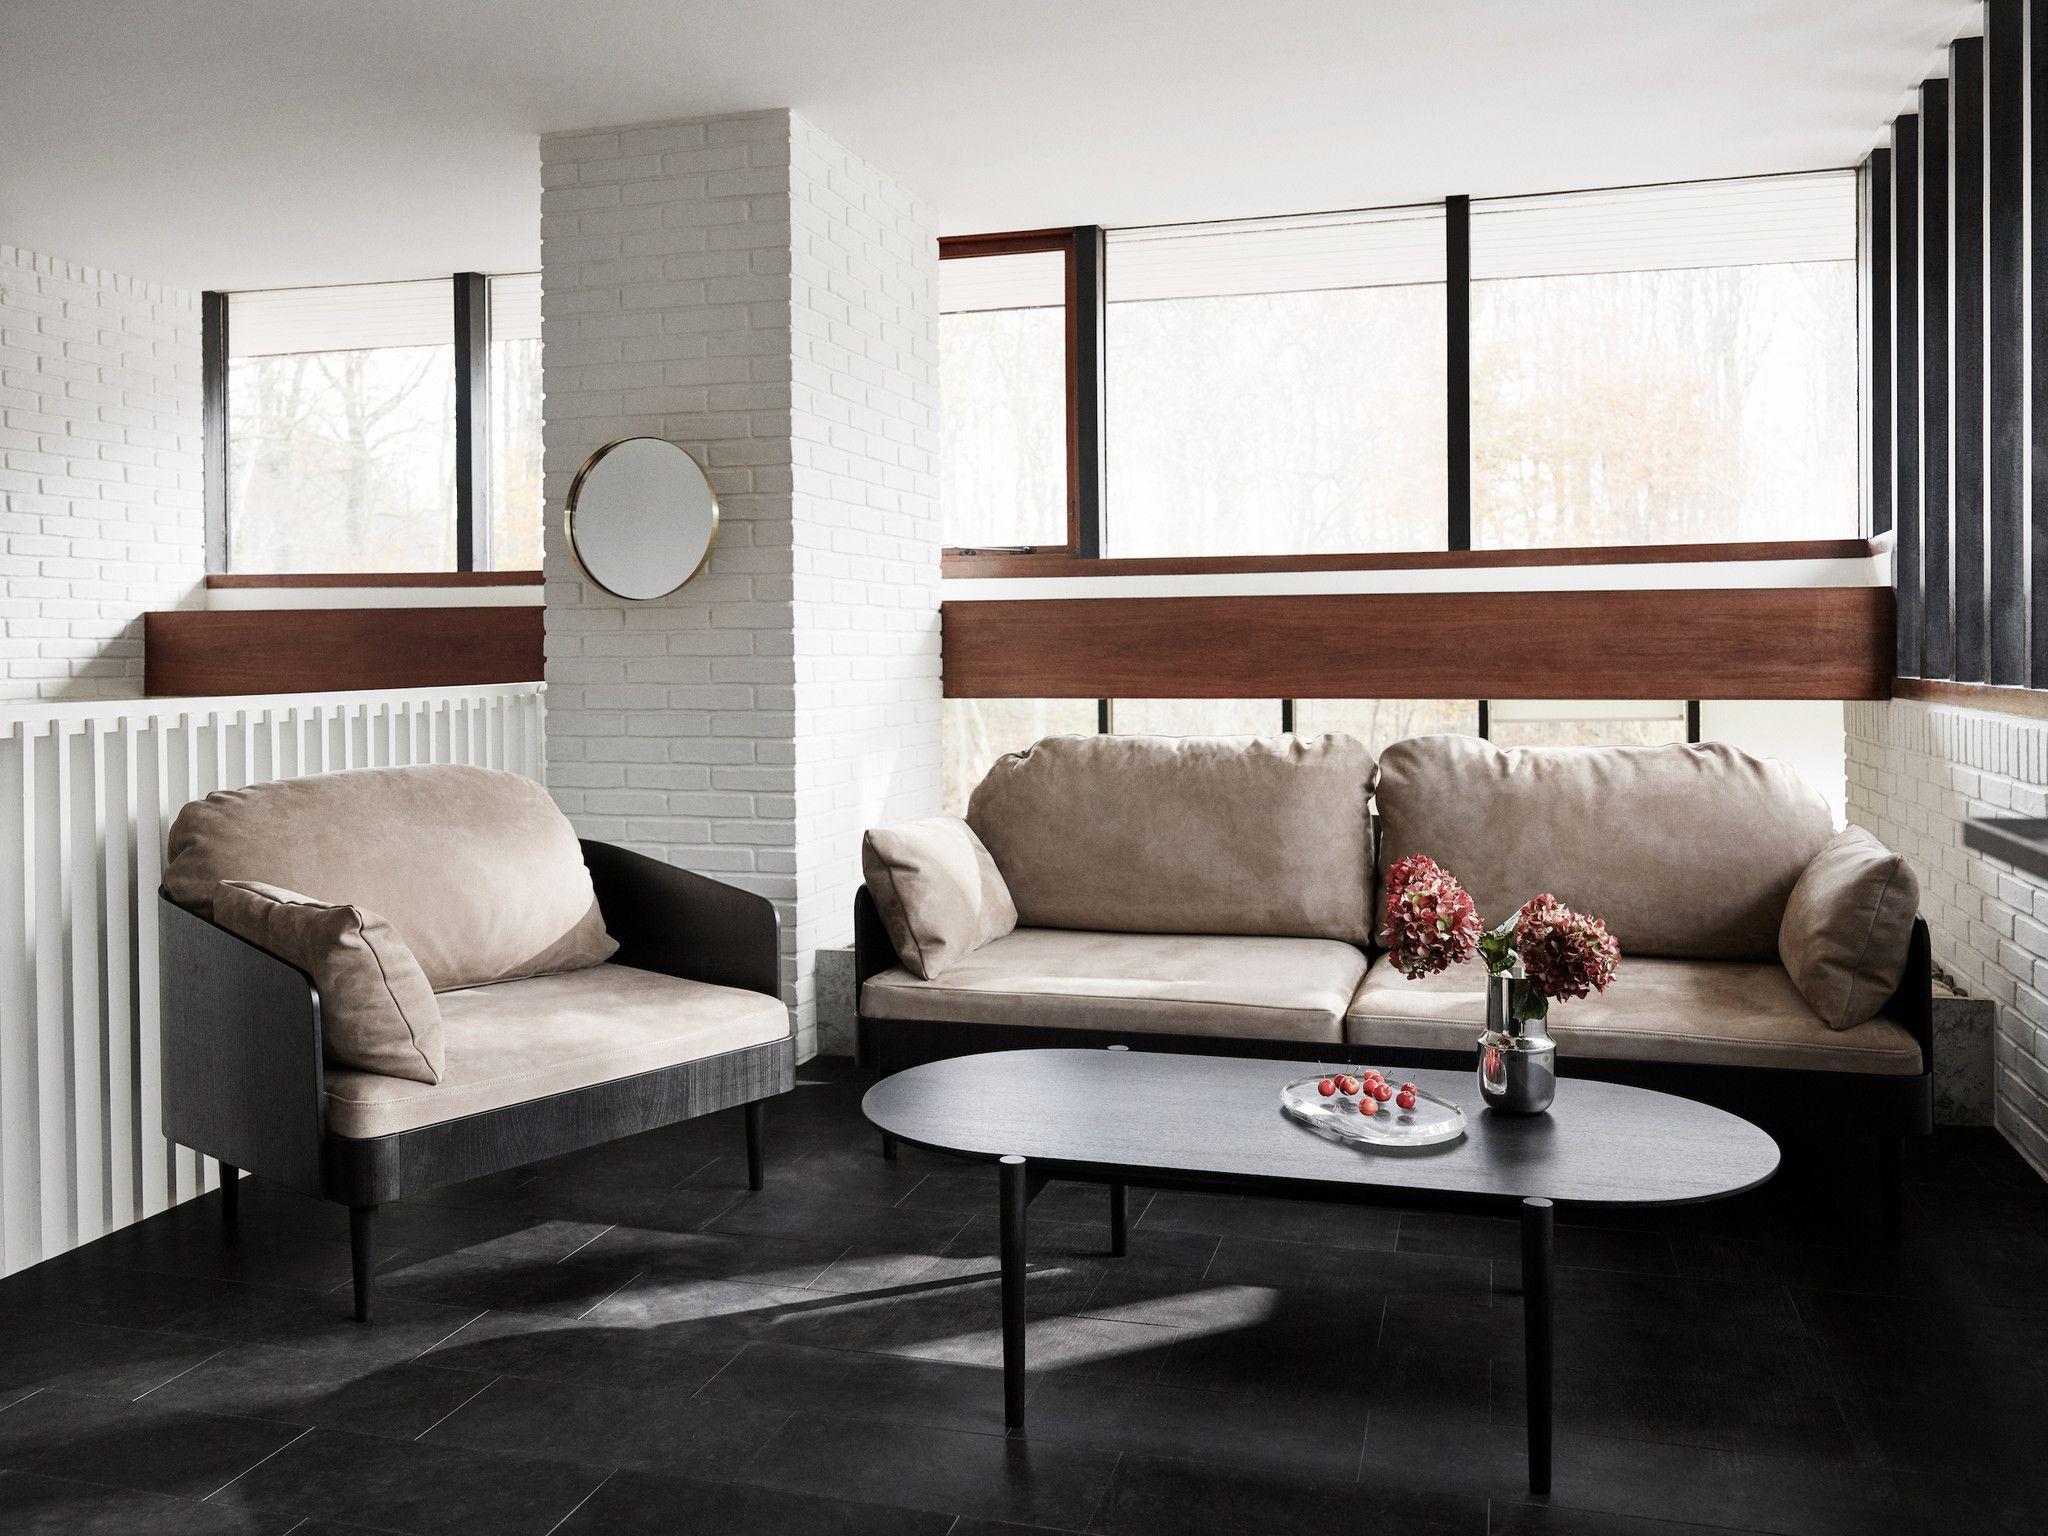 septembre chair, black ash / light gray - sofa from menu, Innenarchitektur ideen